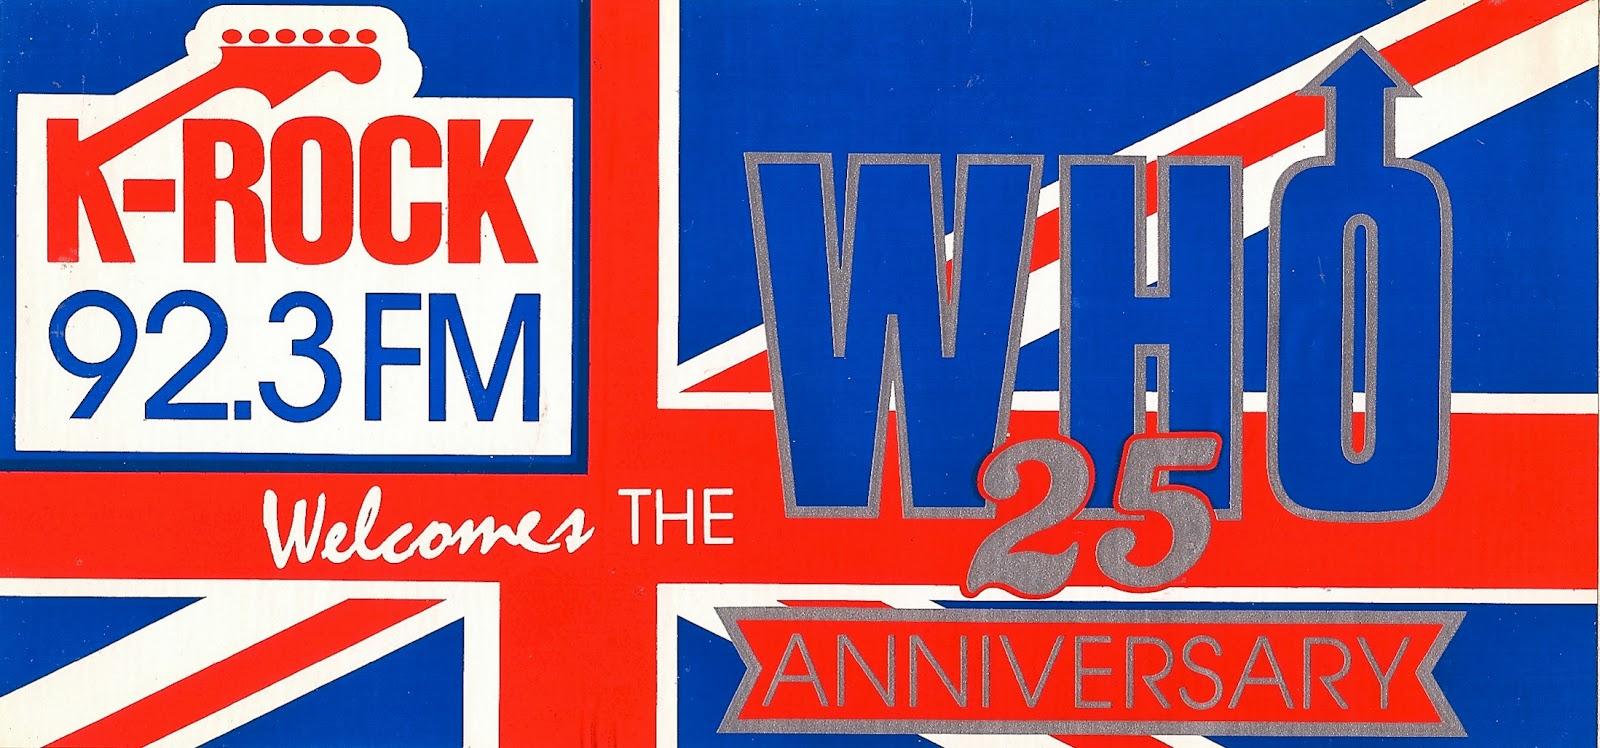 Radio Sticker of the Day: WXRK